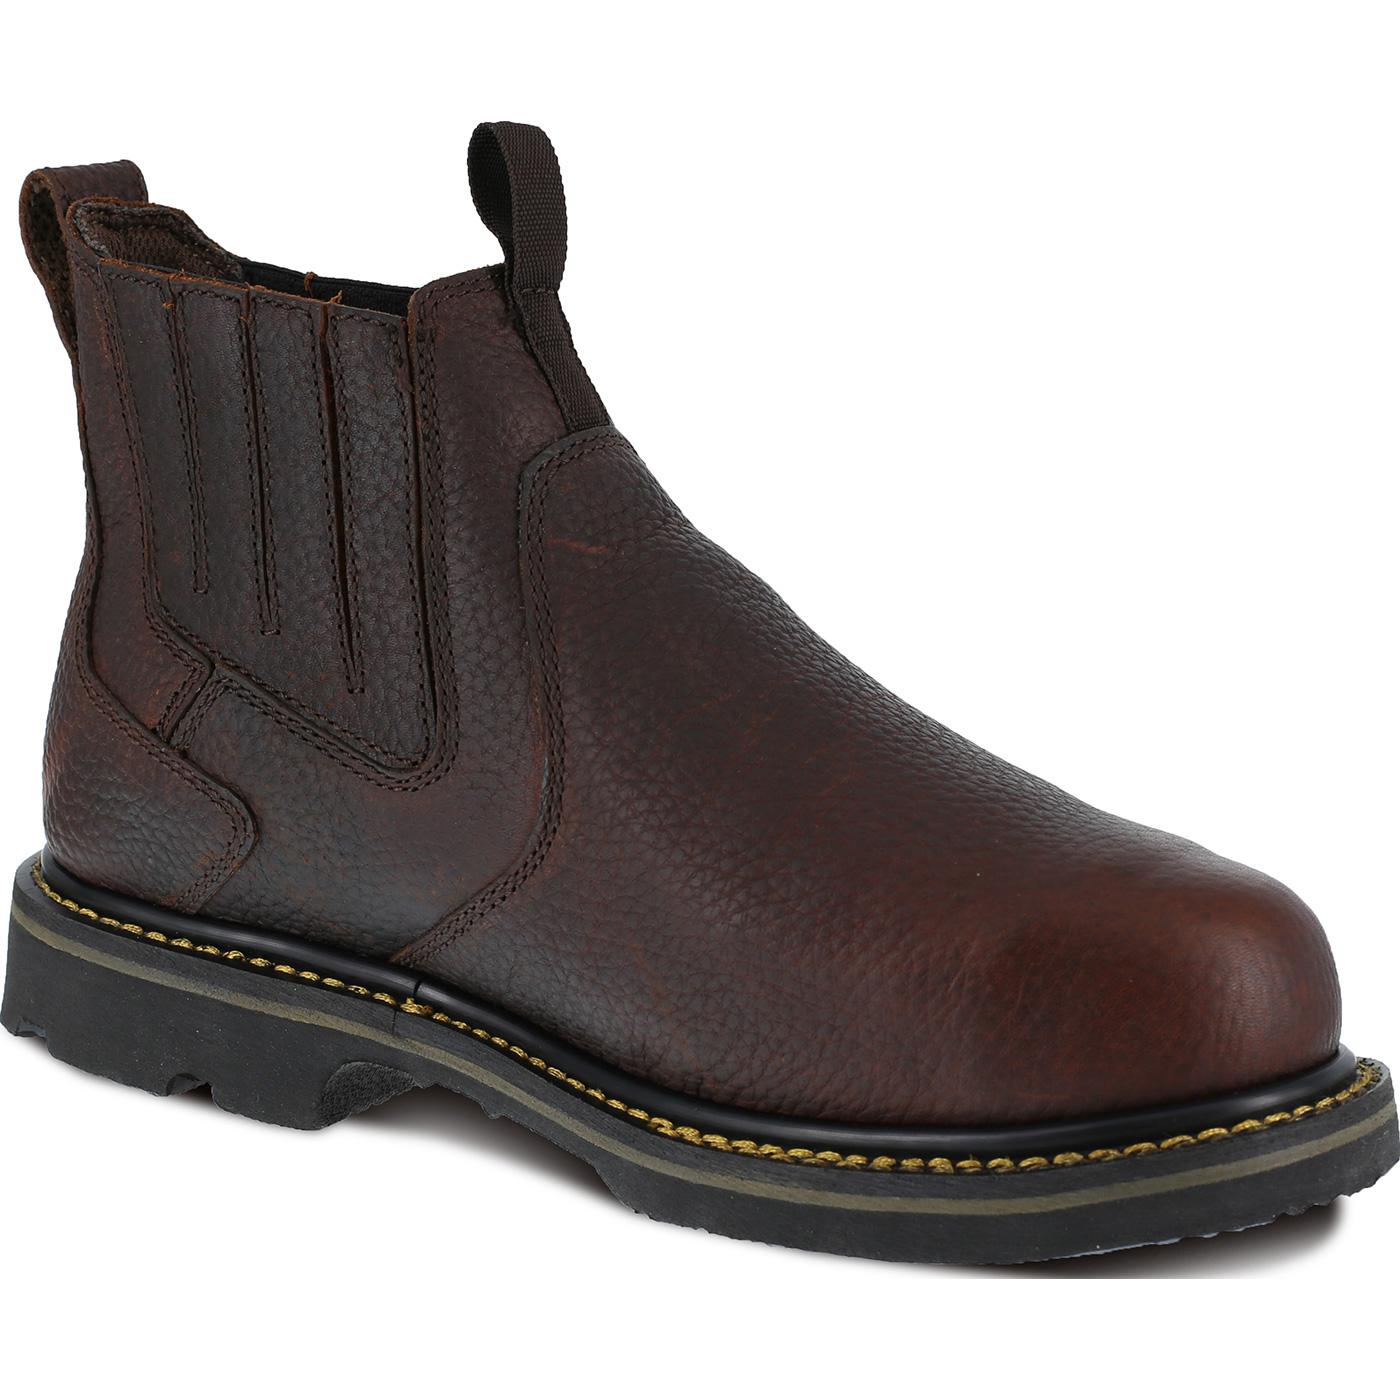 a744734793d Iron Age Groundbreaker Men's Internal Met Guard Steel Toe Work Boots